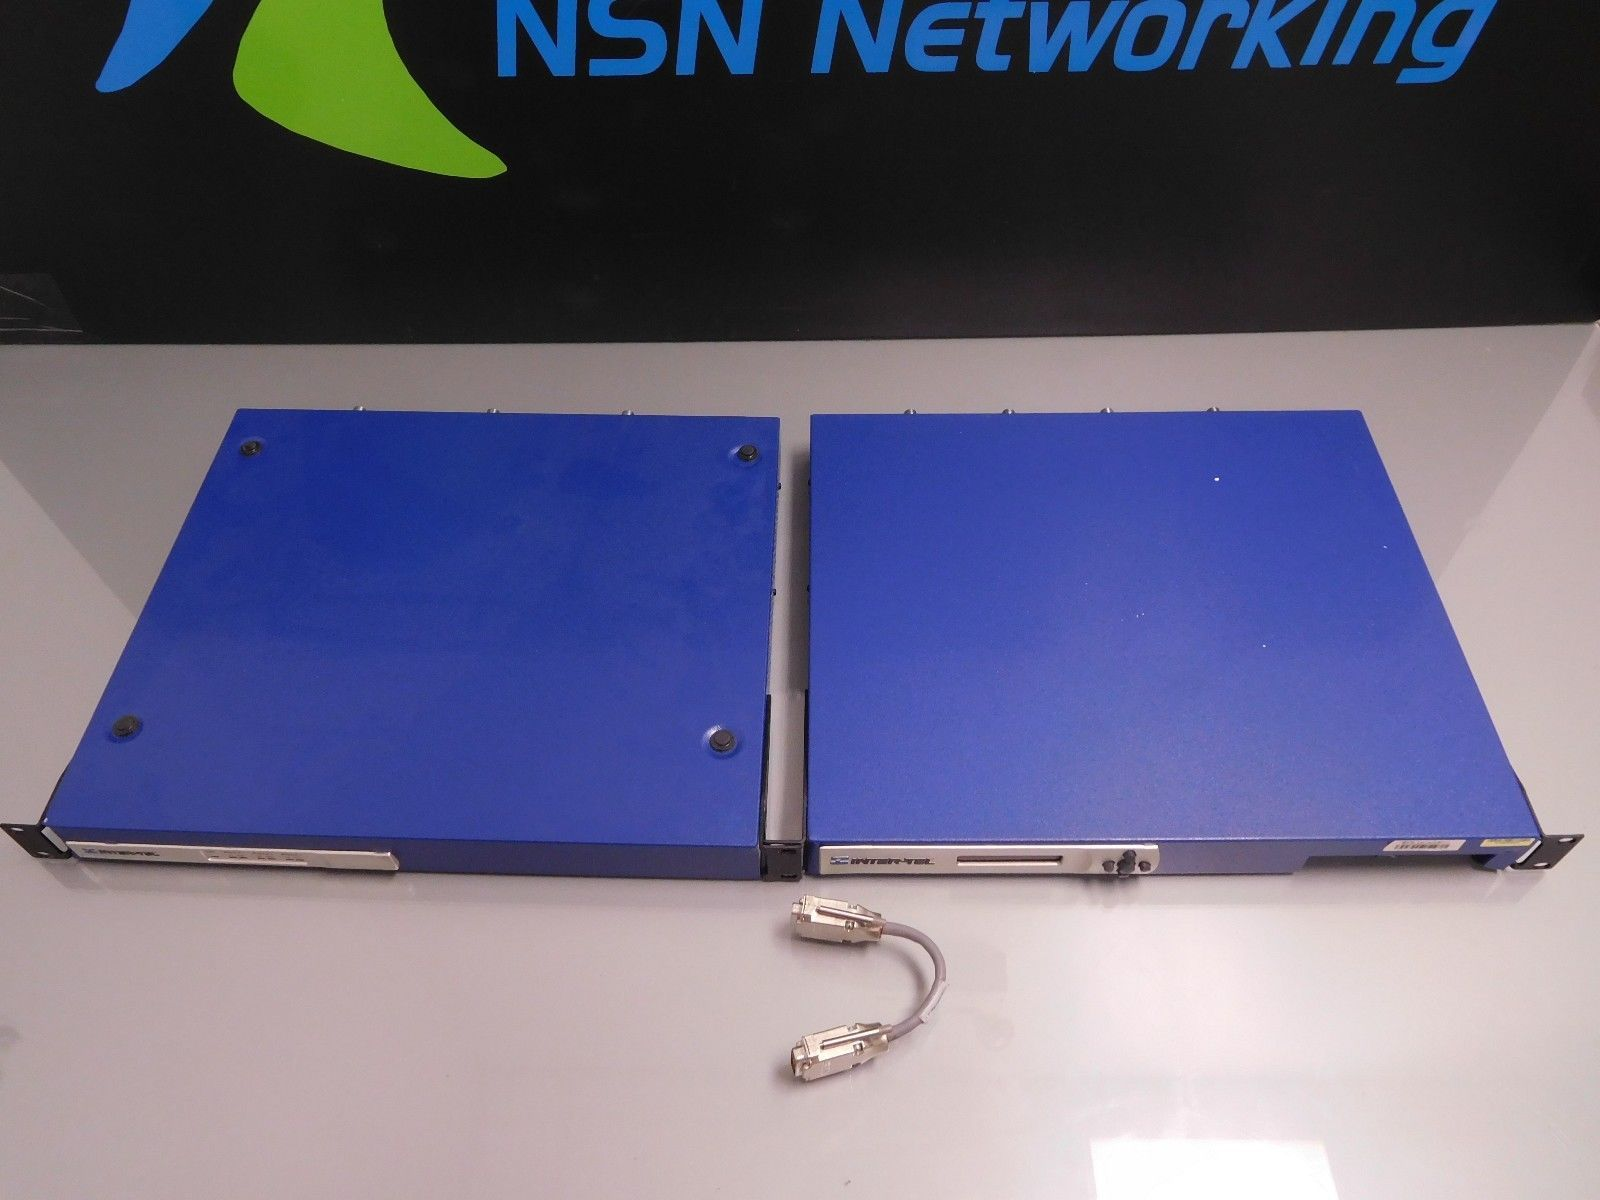 Inter-Tel 5000 System 580-1000 with PM-1 Card 580.2000 Rack Ears Intertel Mitel